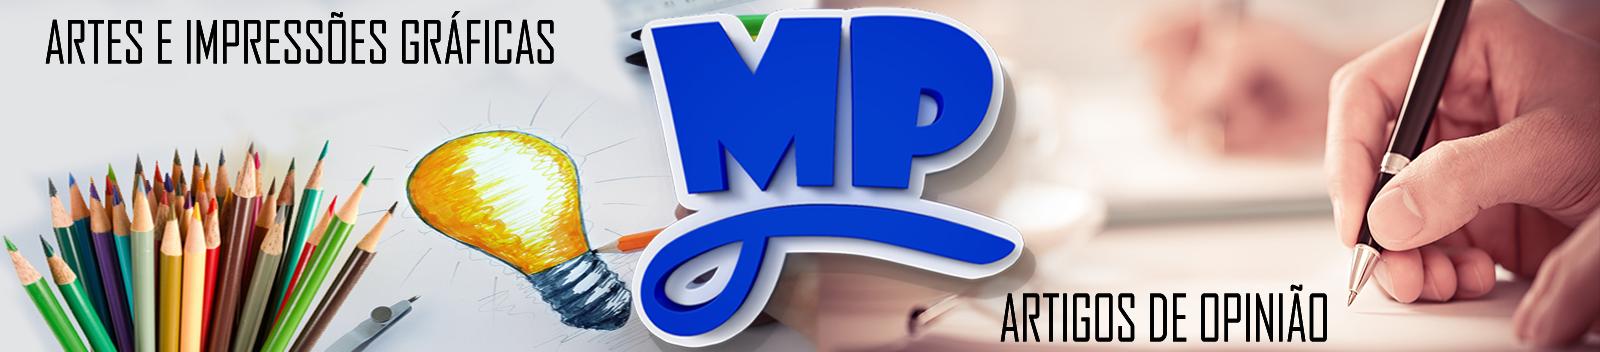 MP DESIGNER GRÁFICO